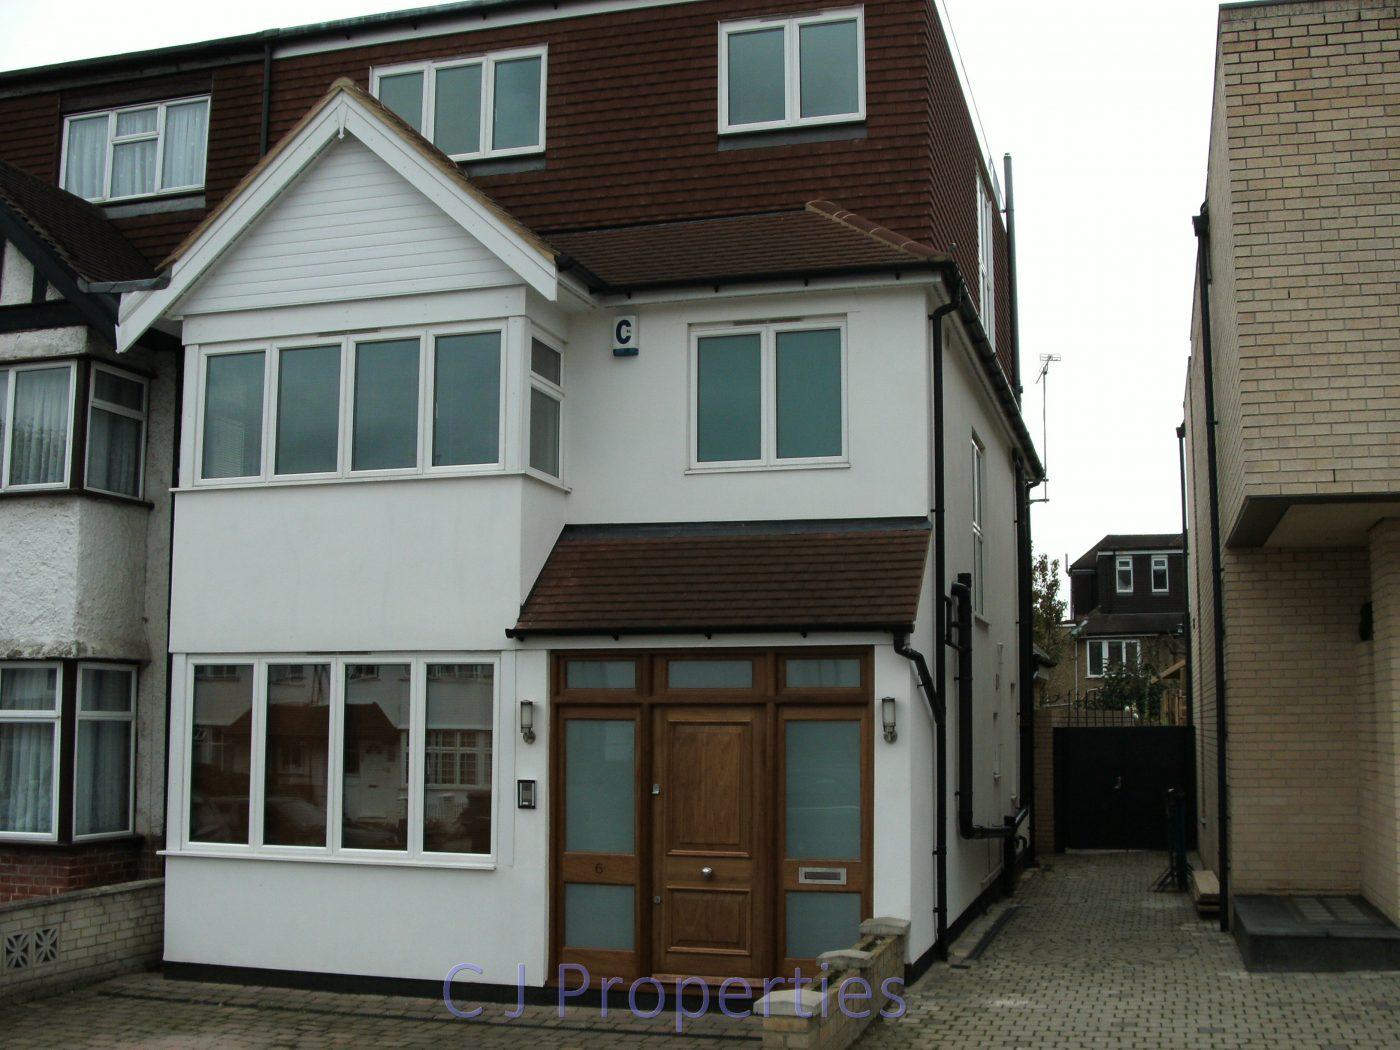 Holmfield Avenue, Hendon - 5 Bed, 4 Bath